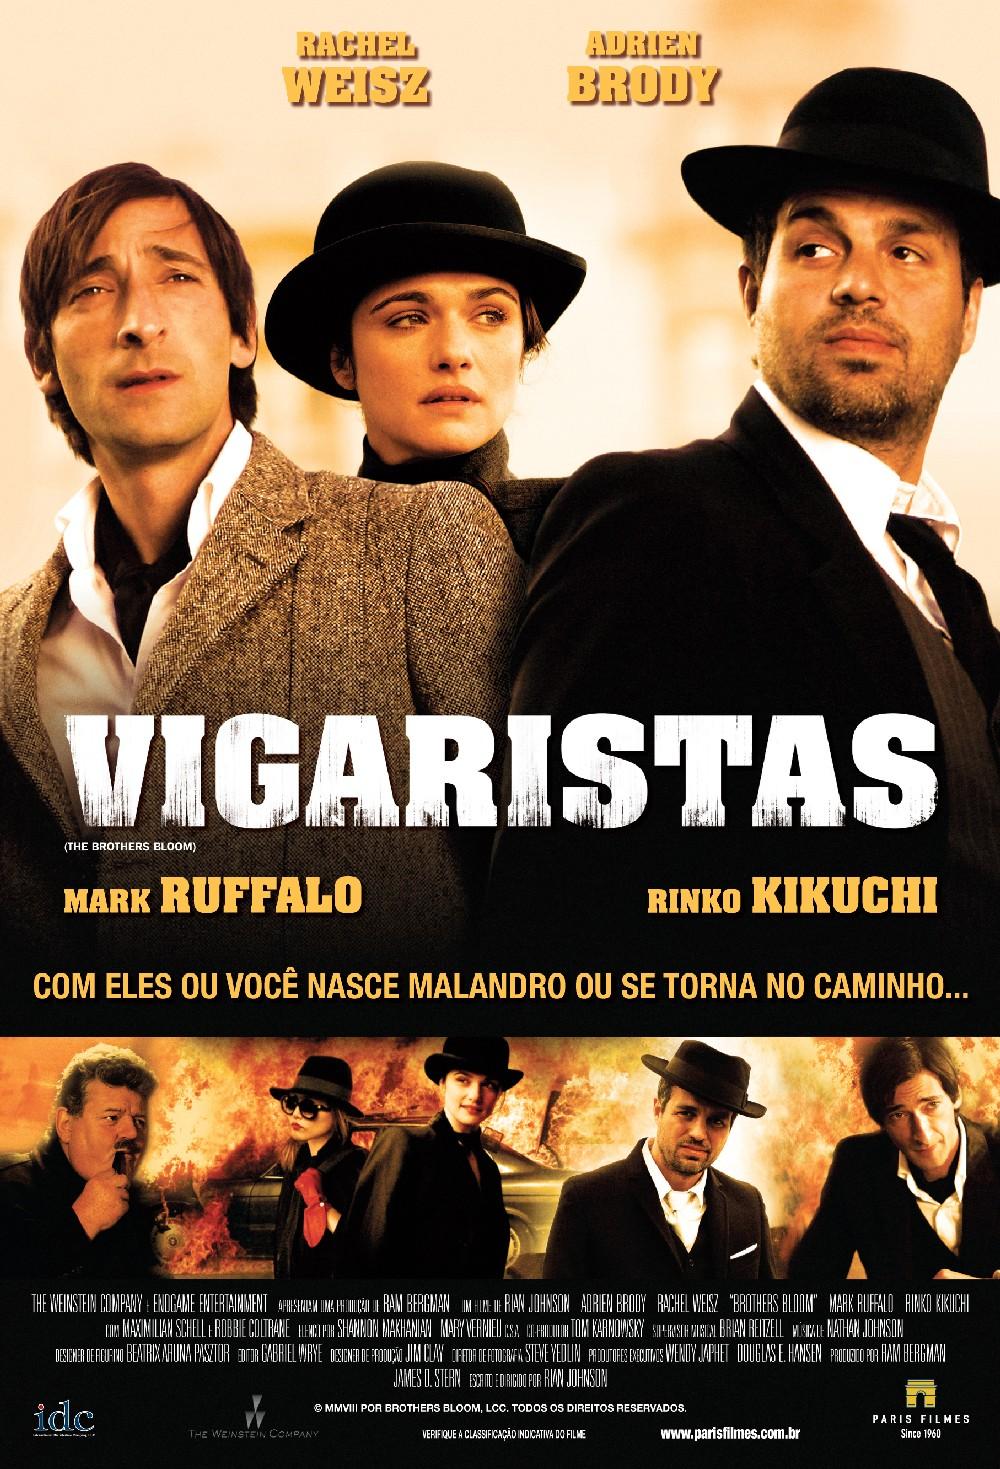 http://www.baladacerta.com.br/images/cinema/filmes_161_Vigaristas%20Poster.jpg